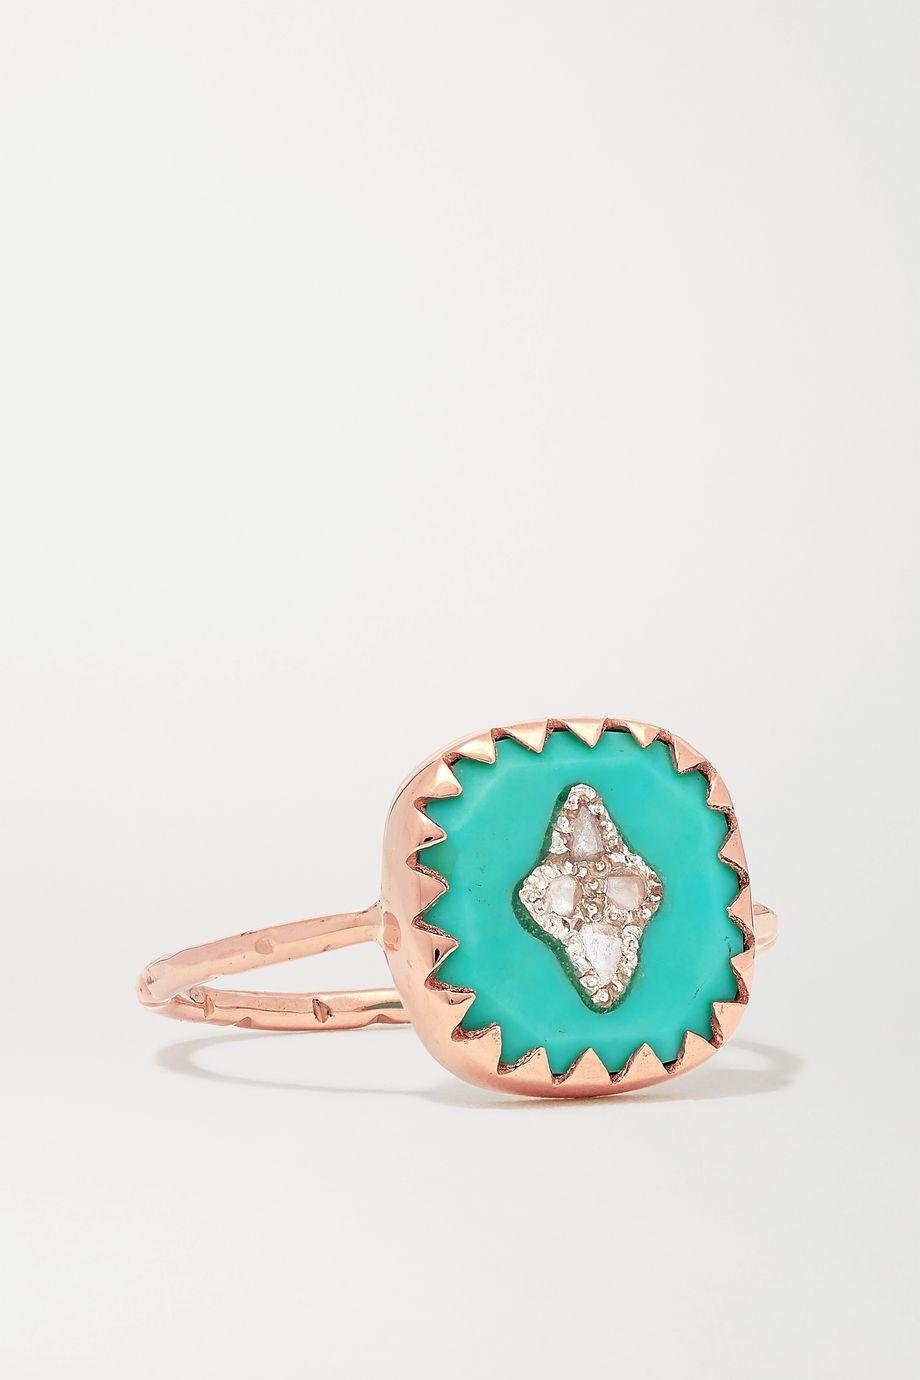 Pascale Monvoisin Pierrot 9-karat rose gold, turquoise and diamond ring